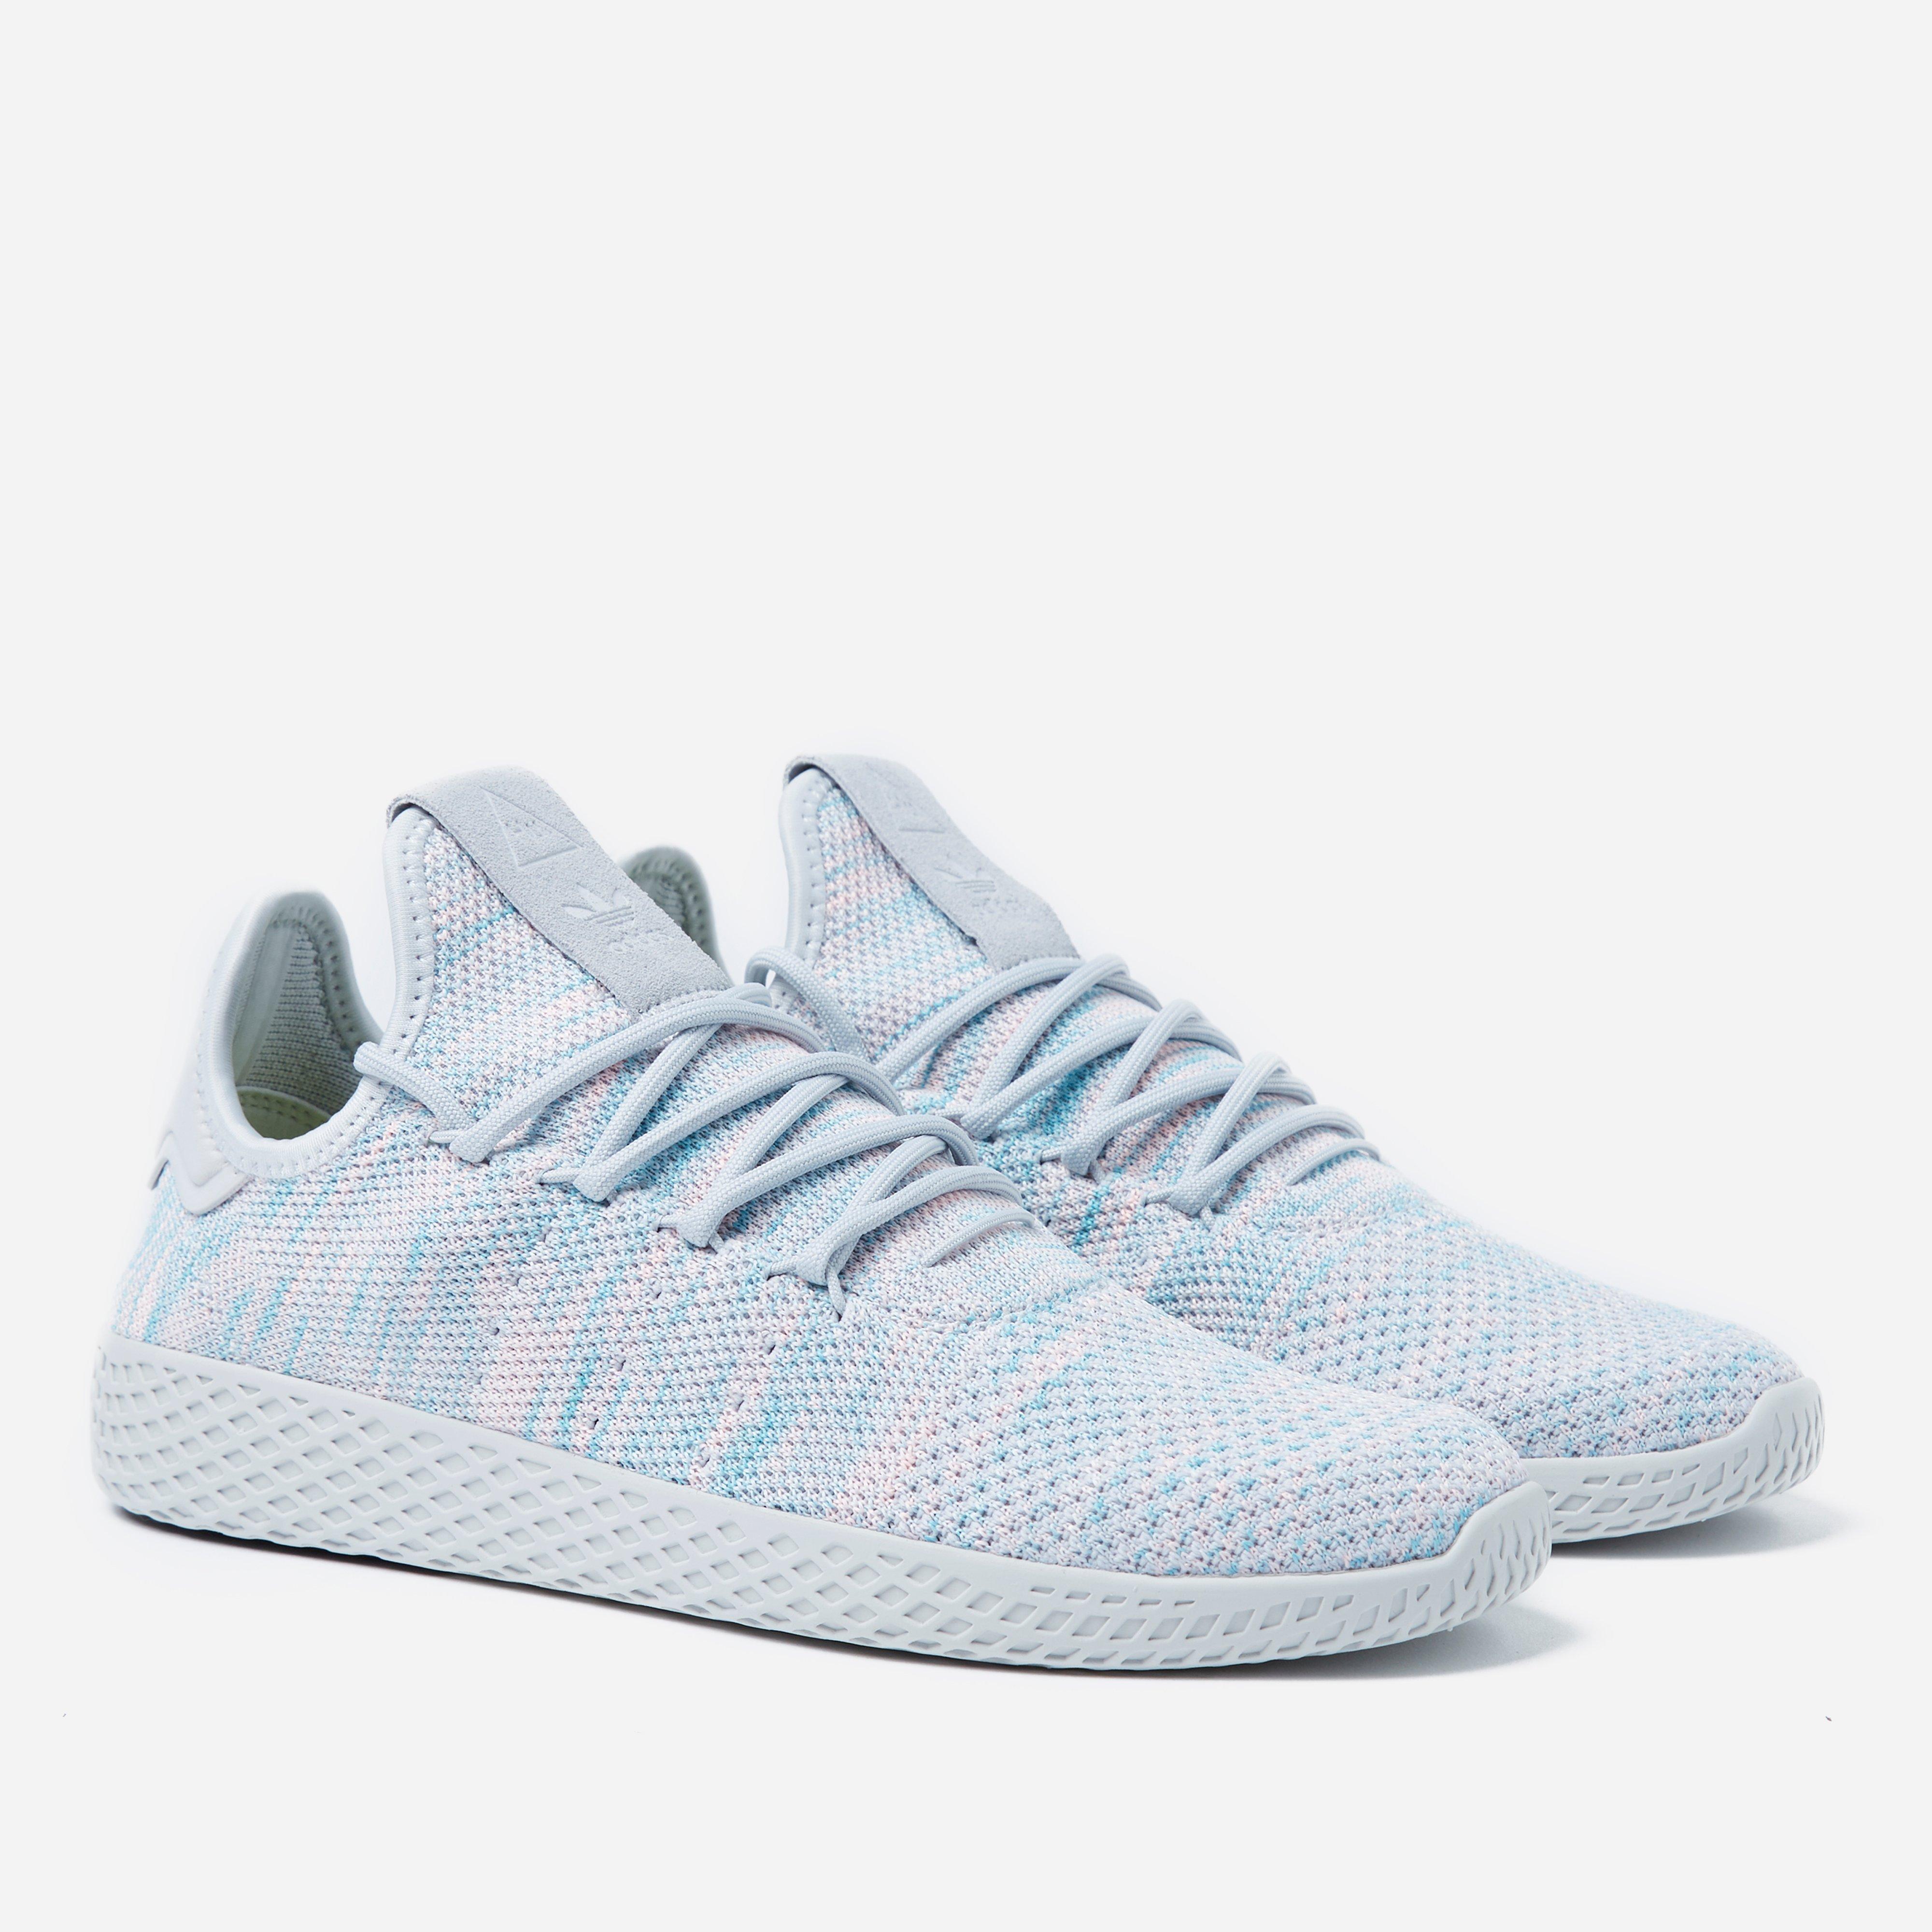 Adidas Tennis Shoes San Diego